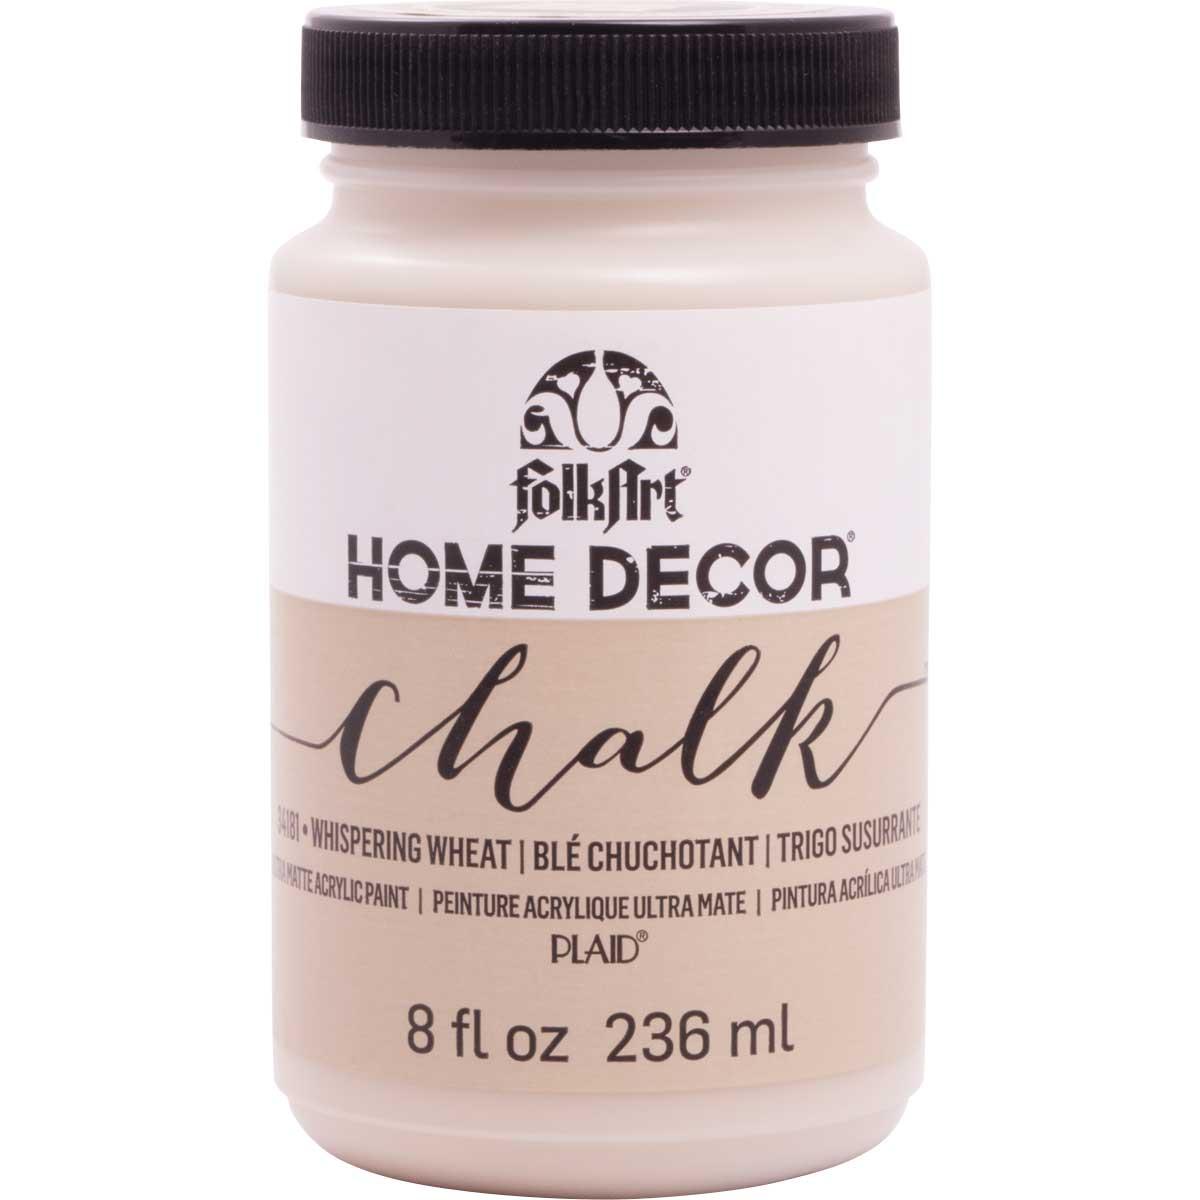 FolkArt ® Home Decor ® Chalk - Whispering Wheat, 8 oz.